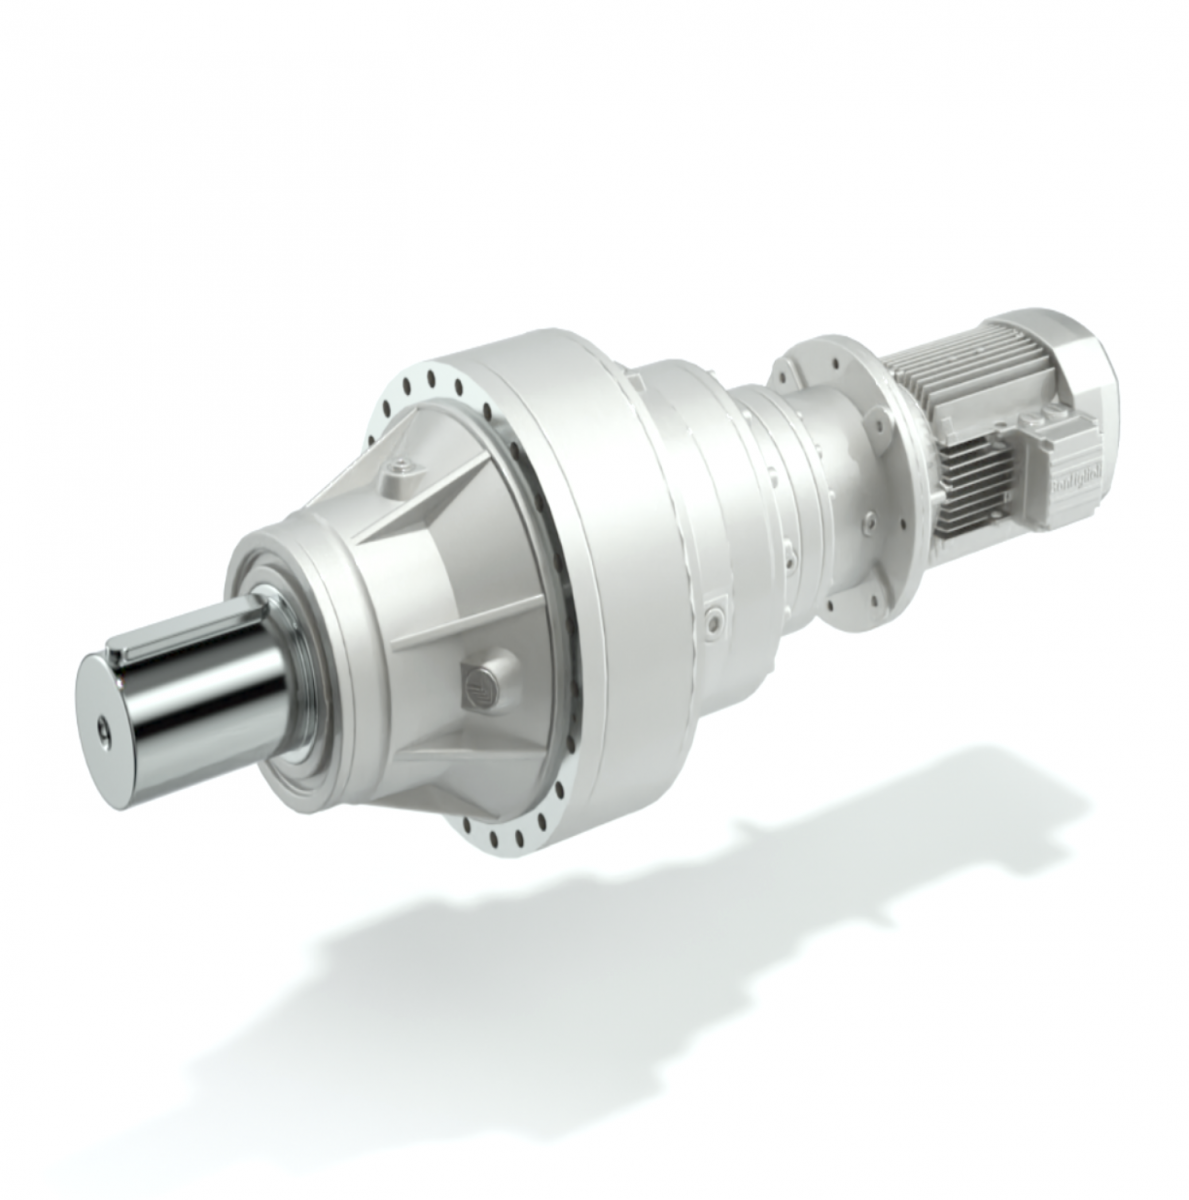 300M Series - Bonfiglioli planetary gearbox